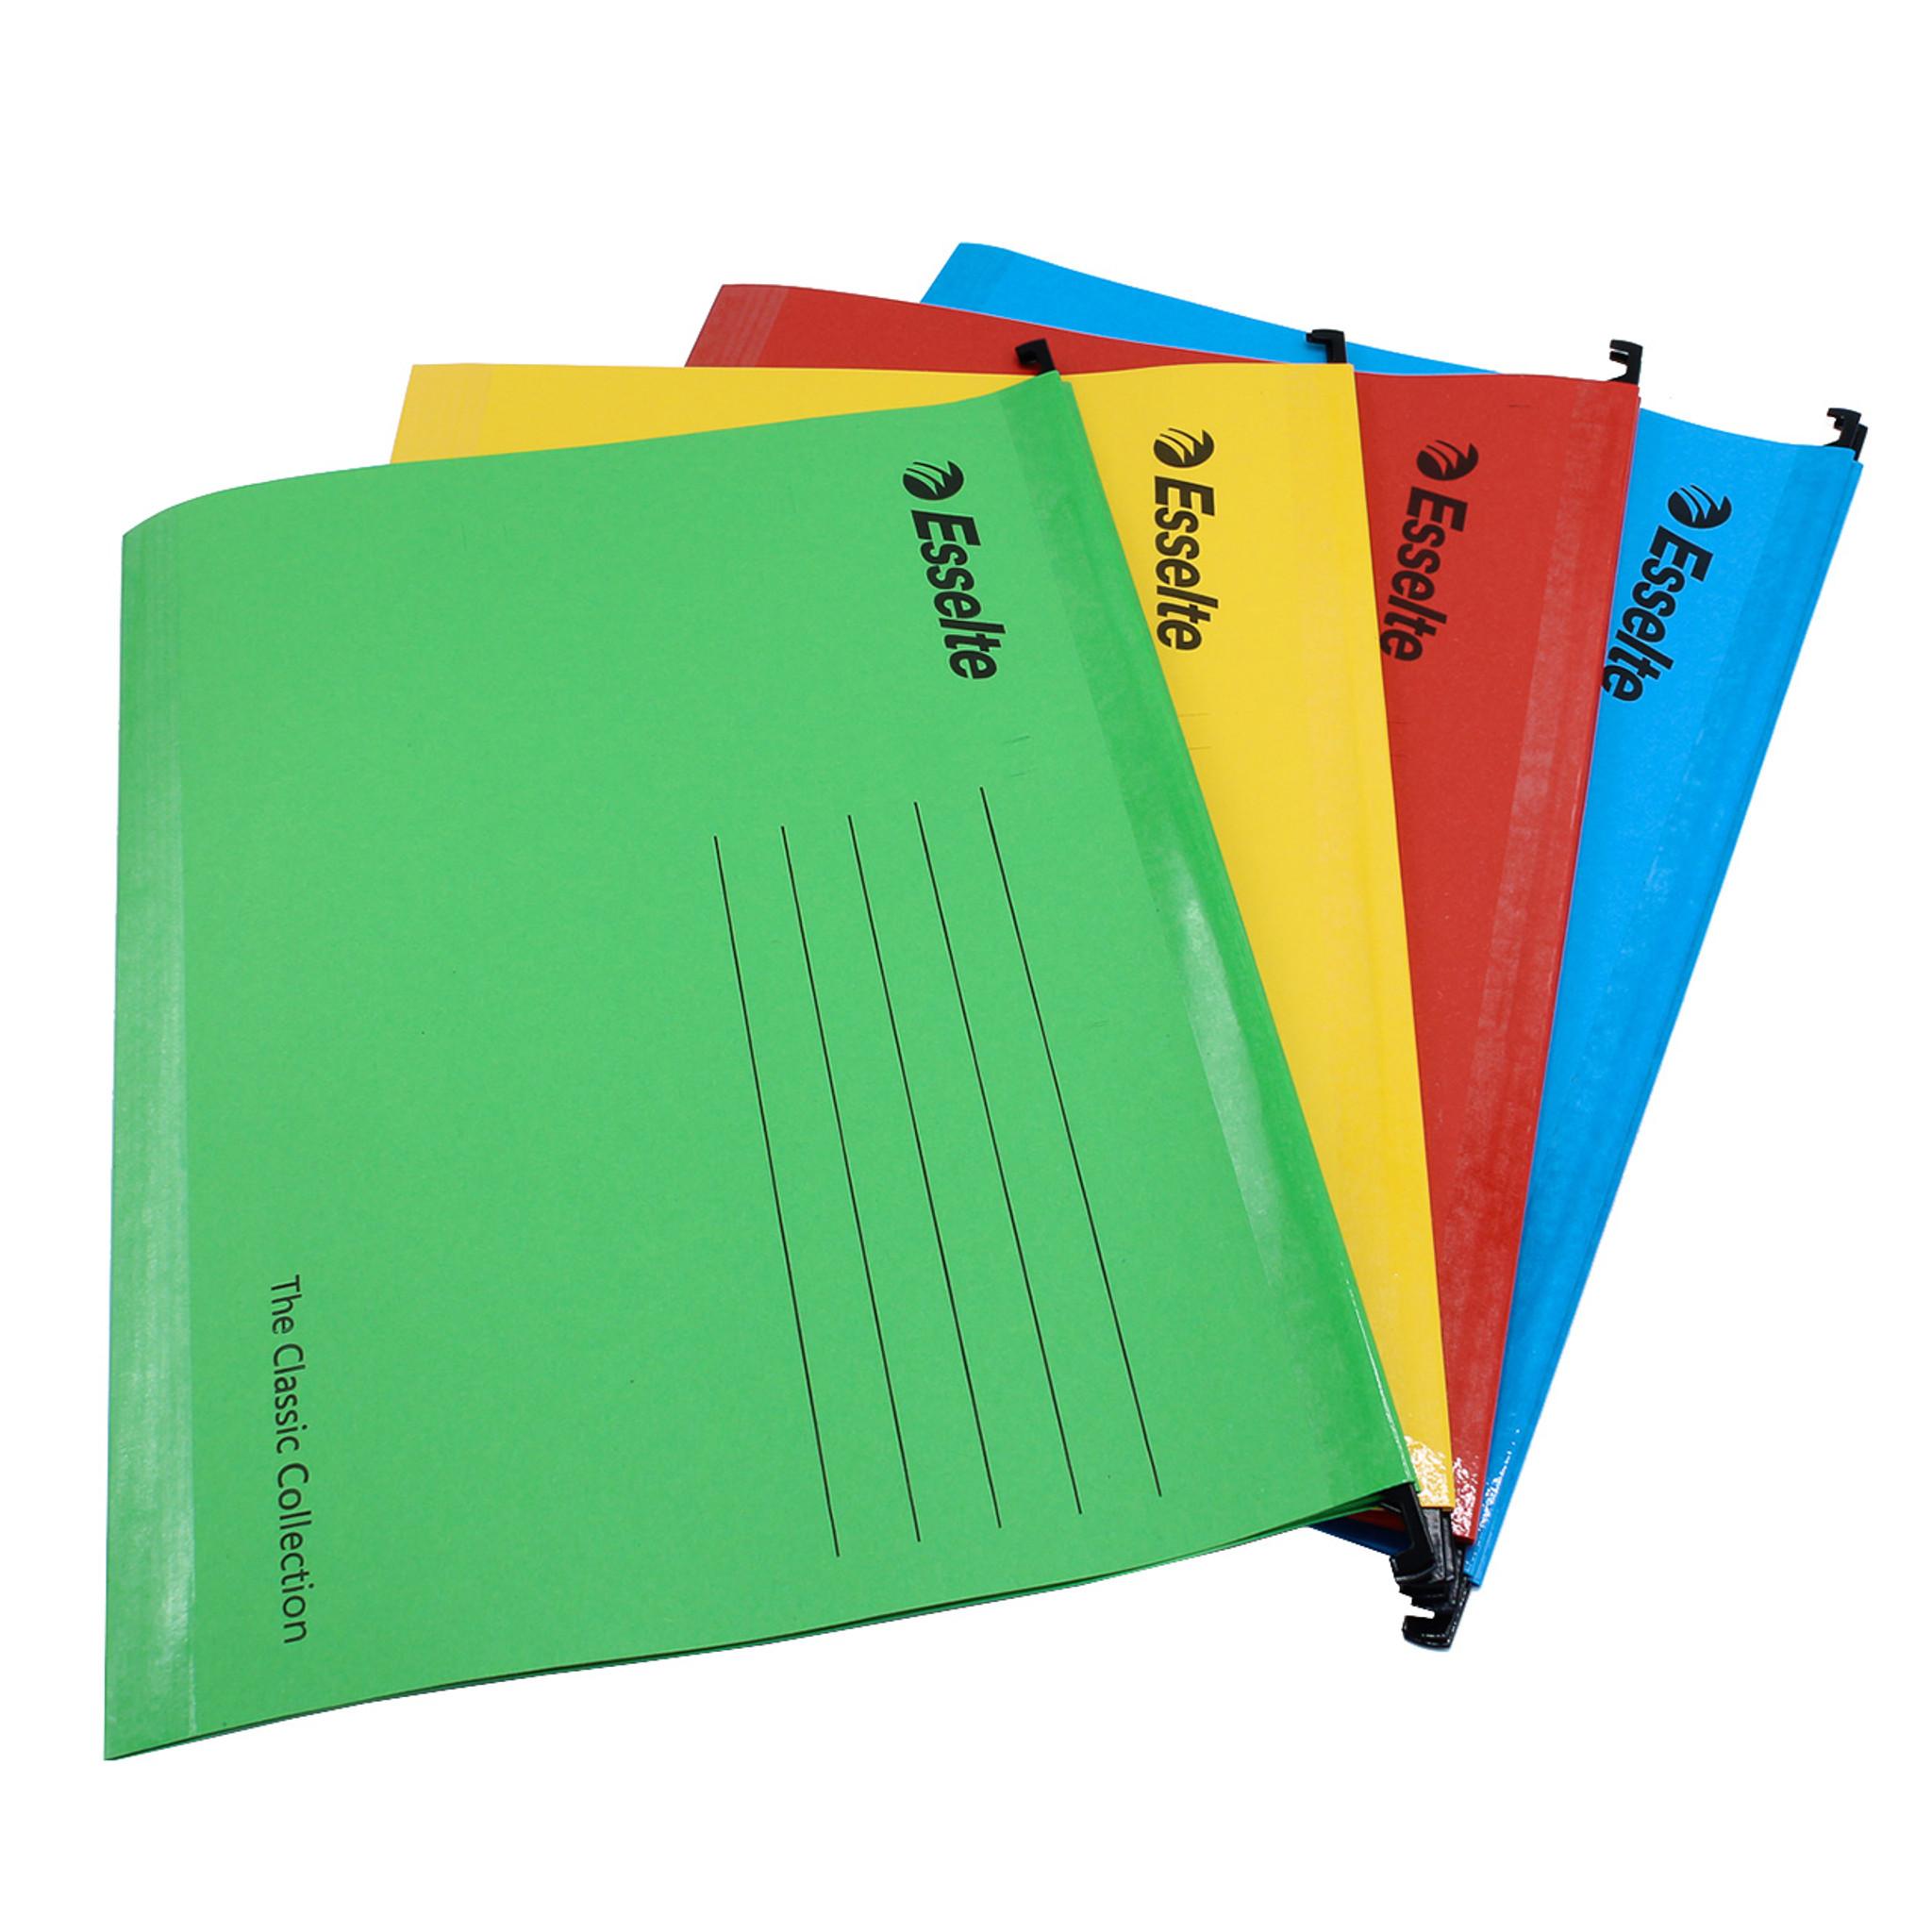 Leitz A4 Hanging Folders